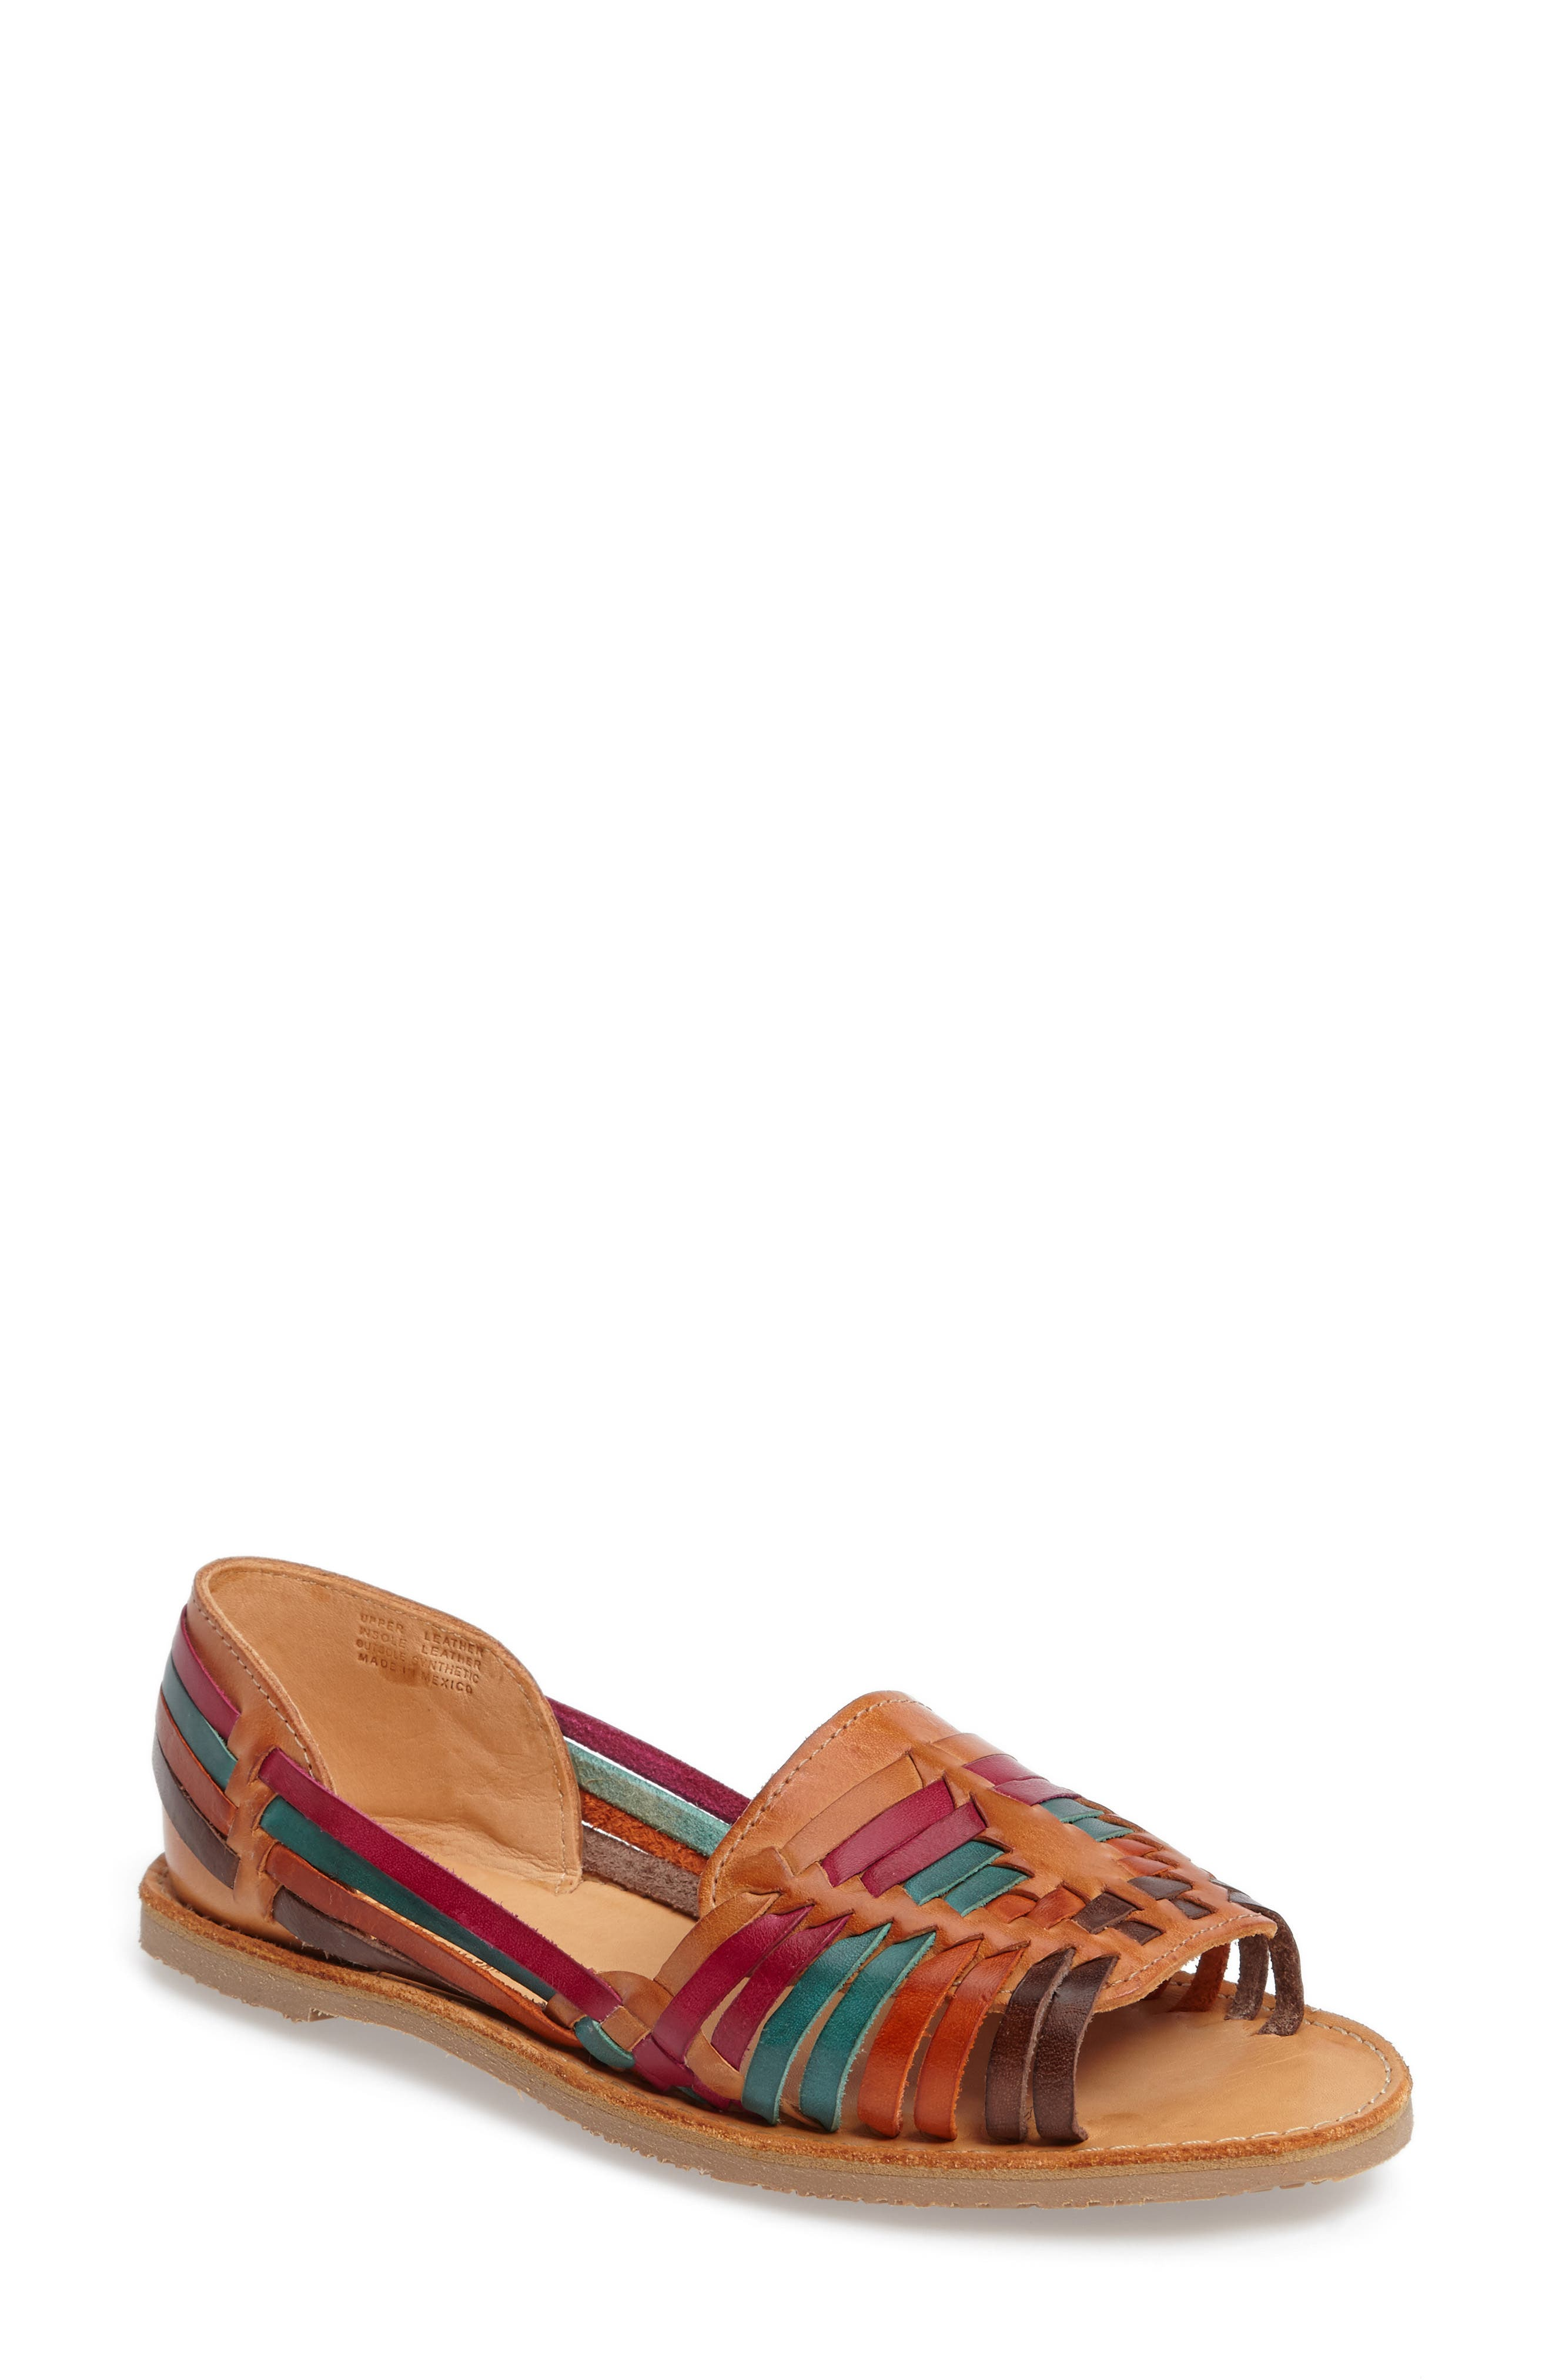 Alternate Image 1 Selected - Sbicca Jared Peep Toe Flat (Women)